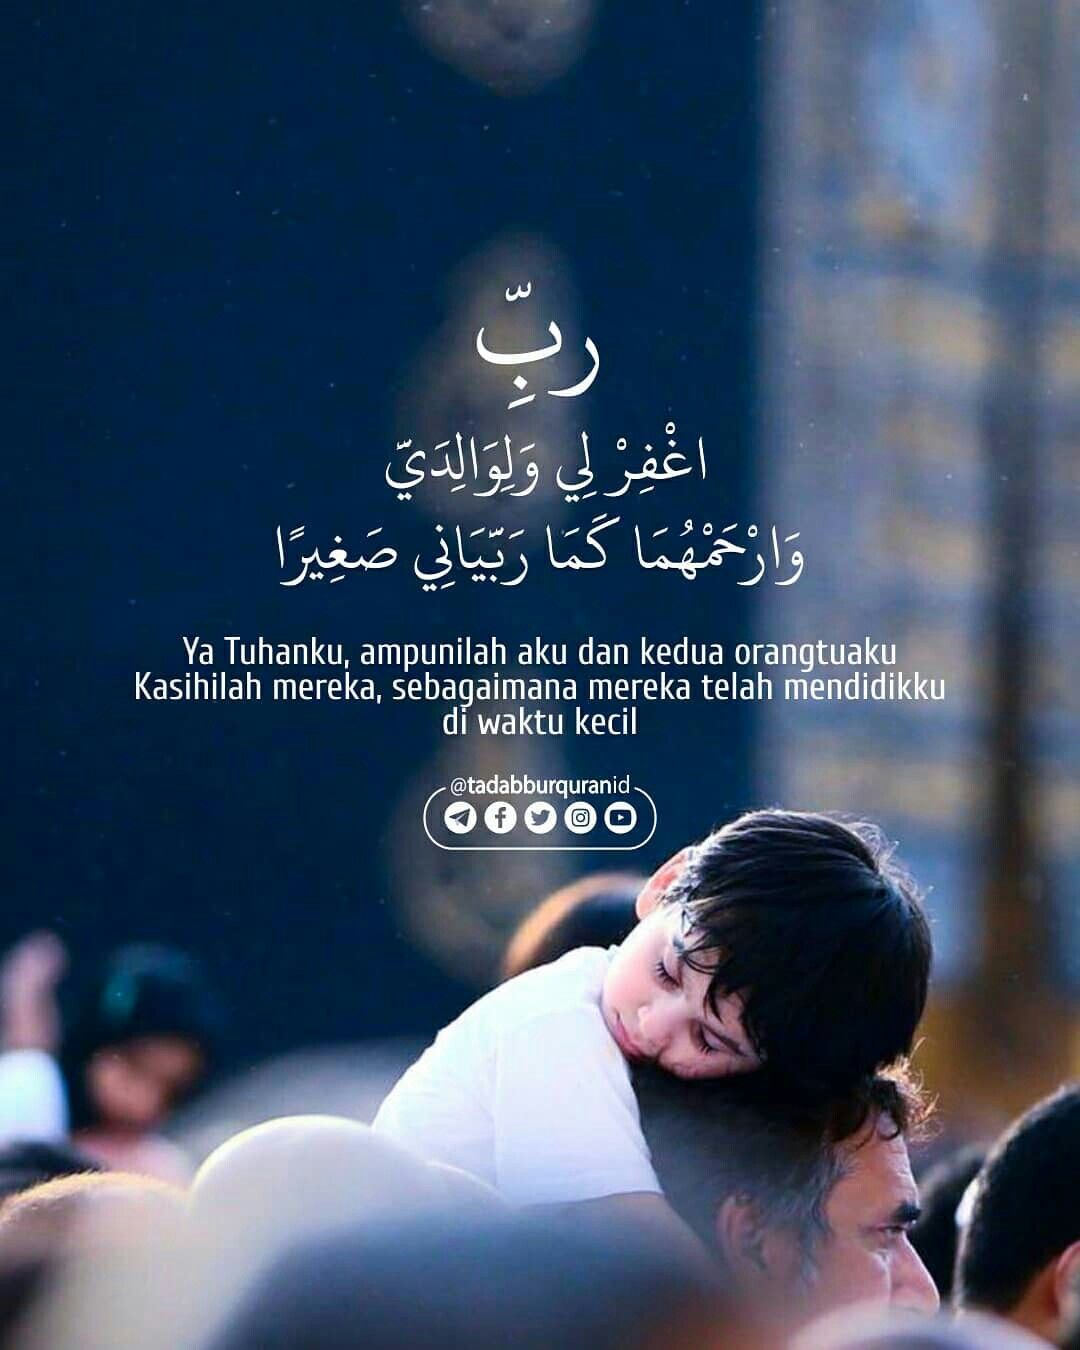 Doa Indah Untuk Orangtua Dengan Gambar Kata Kata Indah Moto